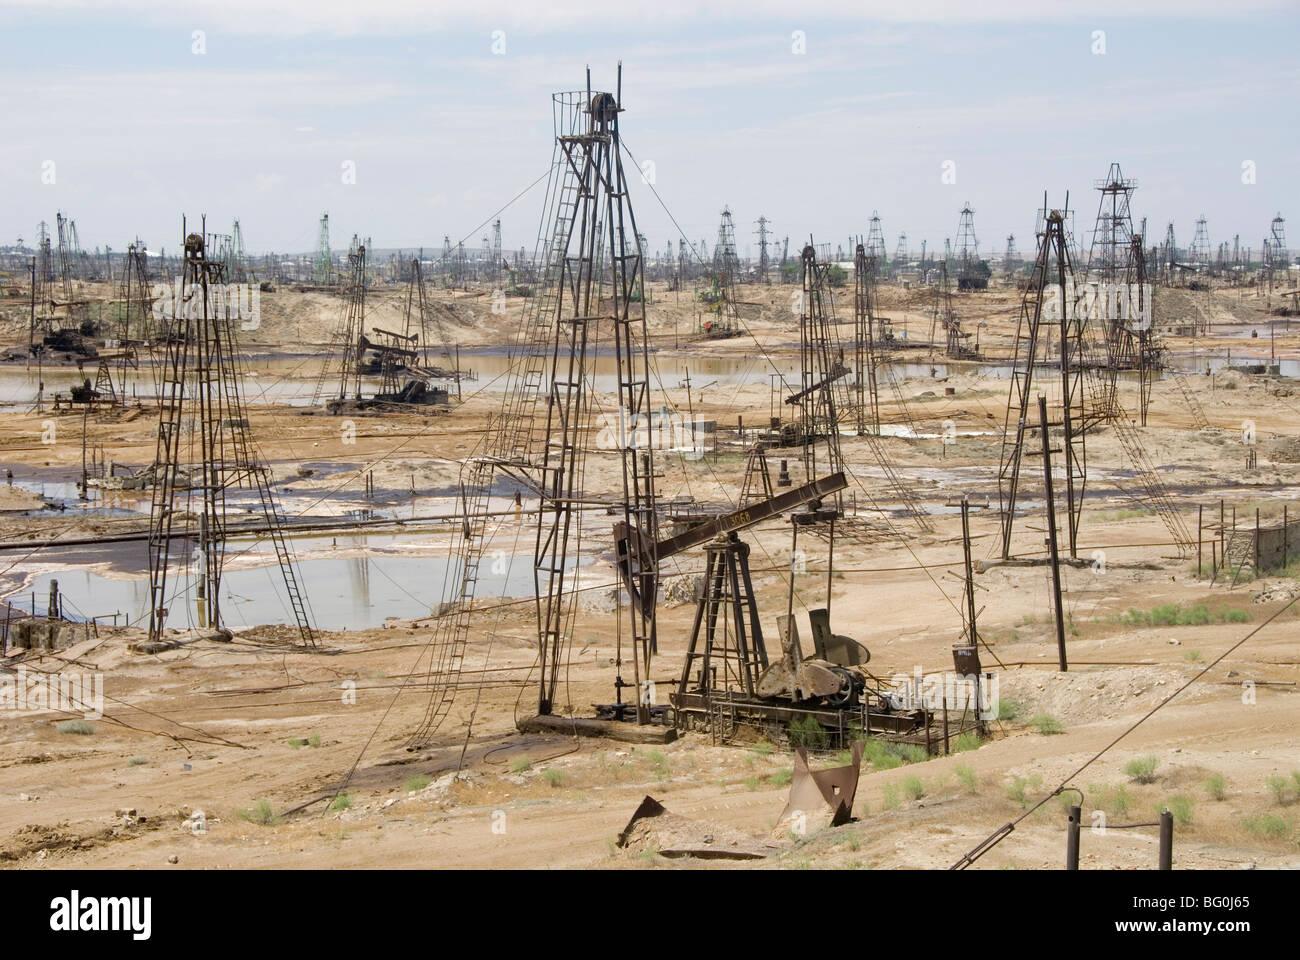 Closely spaced drilling towers and nodding donkey beam pumps, Ramana oilfield, Absheron peninsula, Baku, Azerbaijan - Stock Image